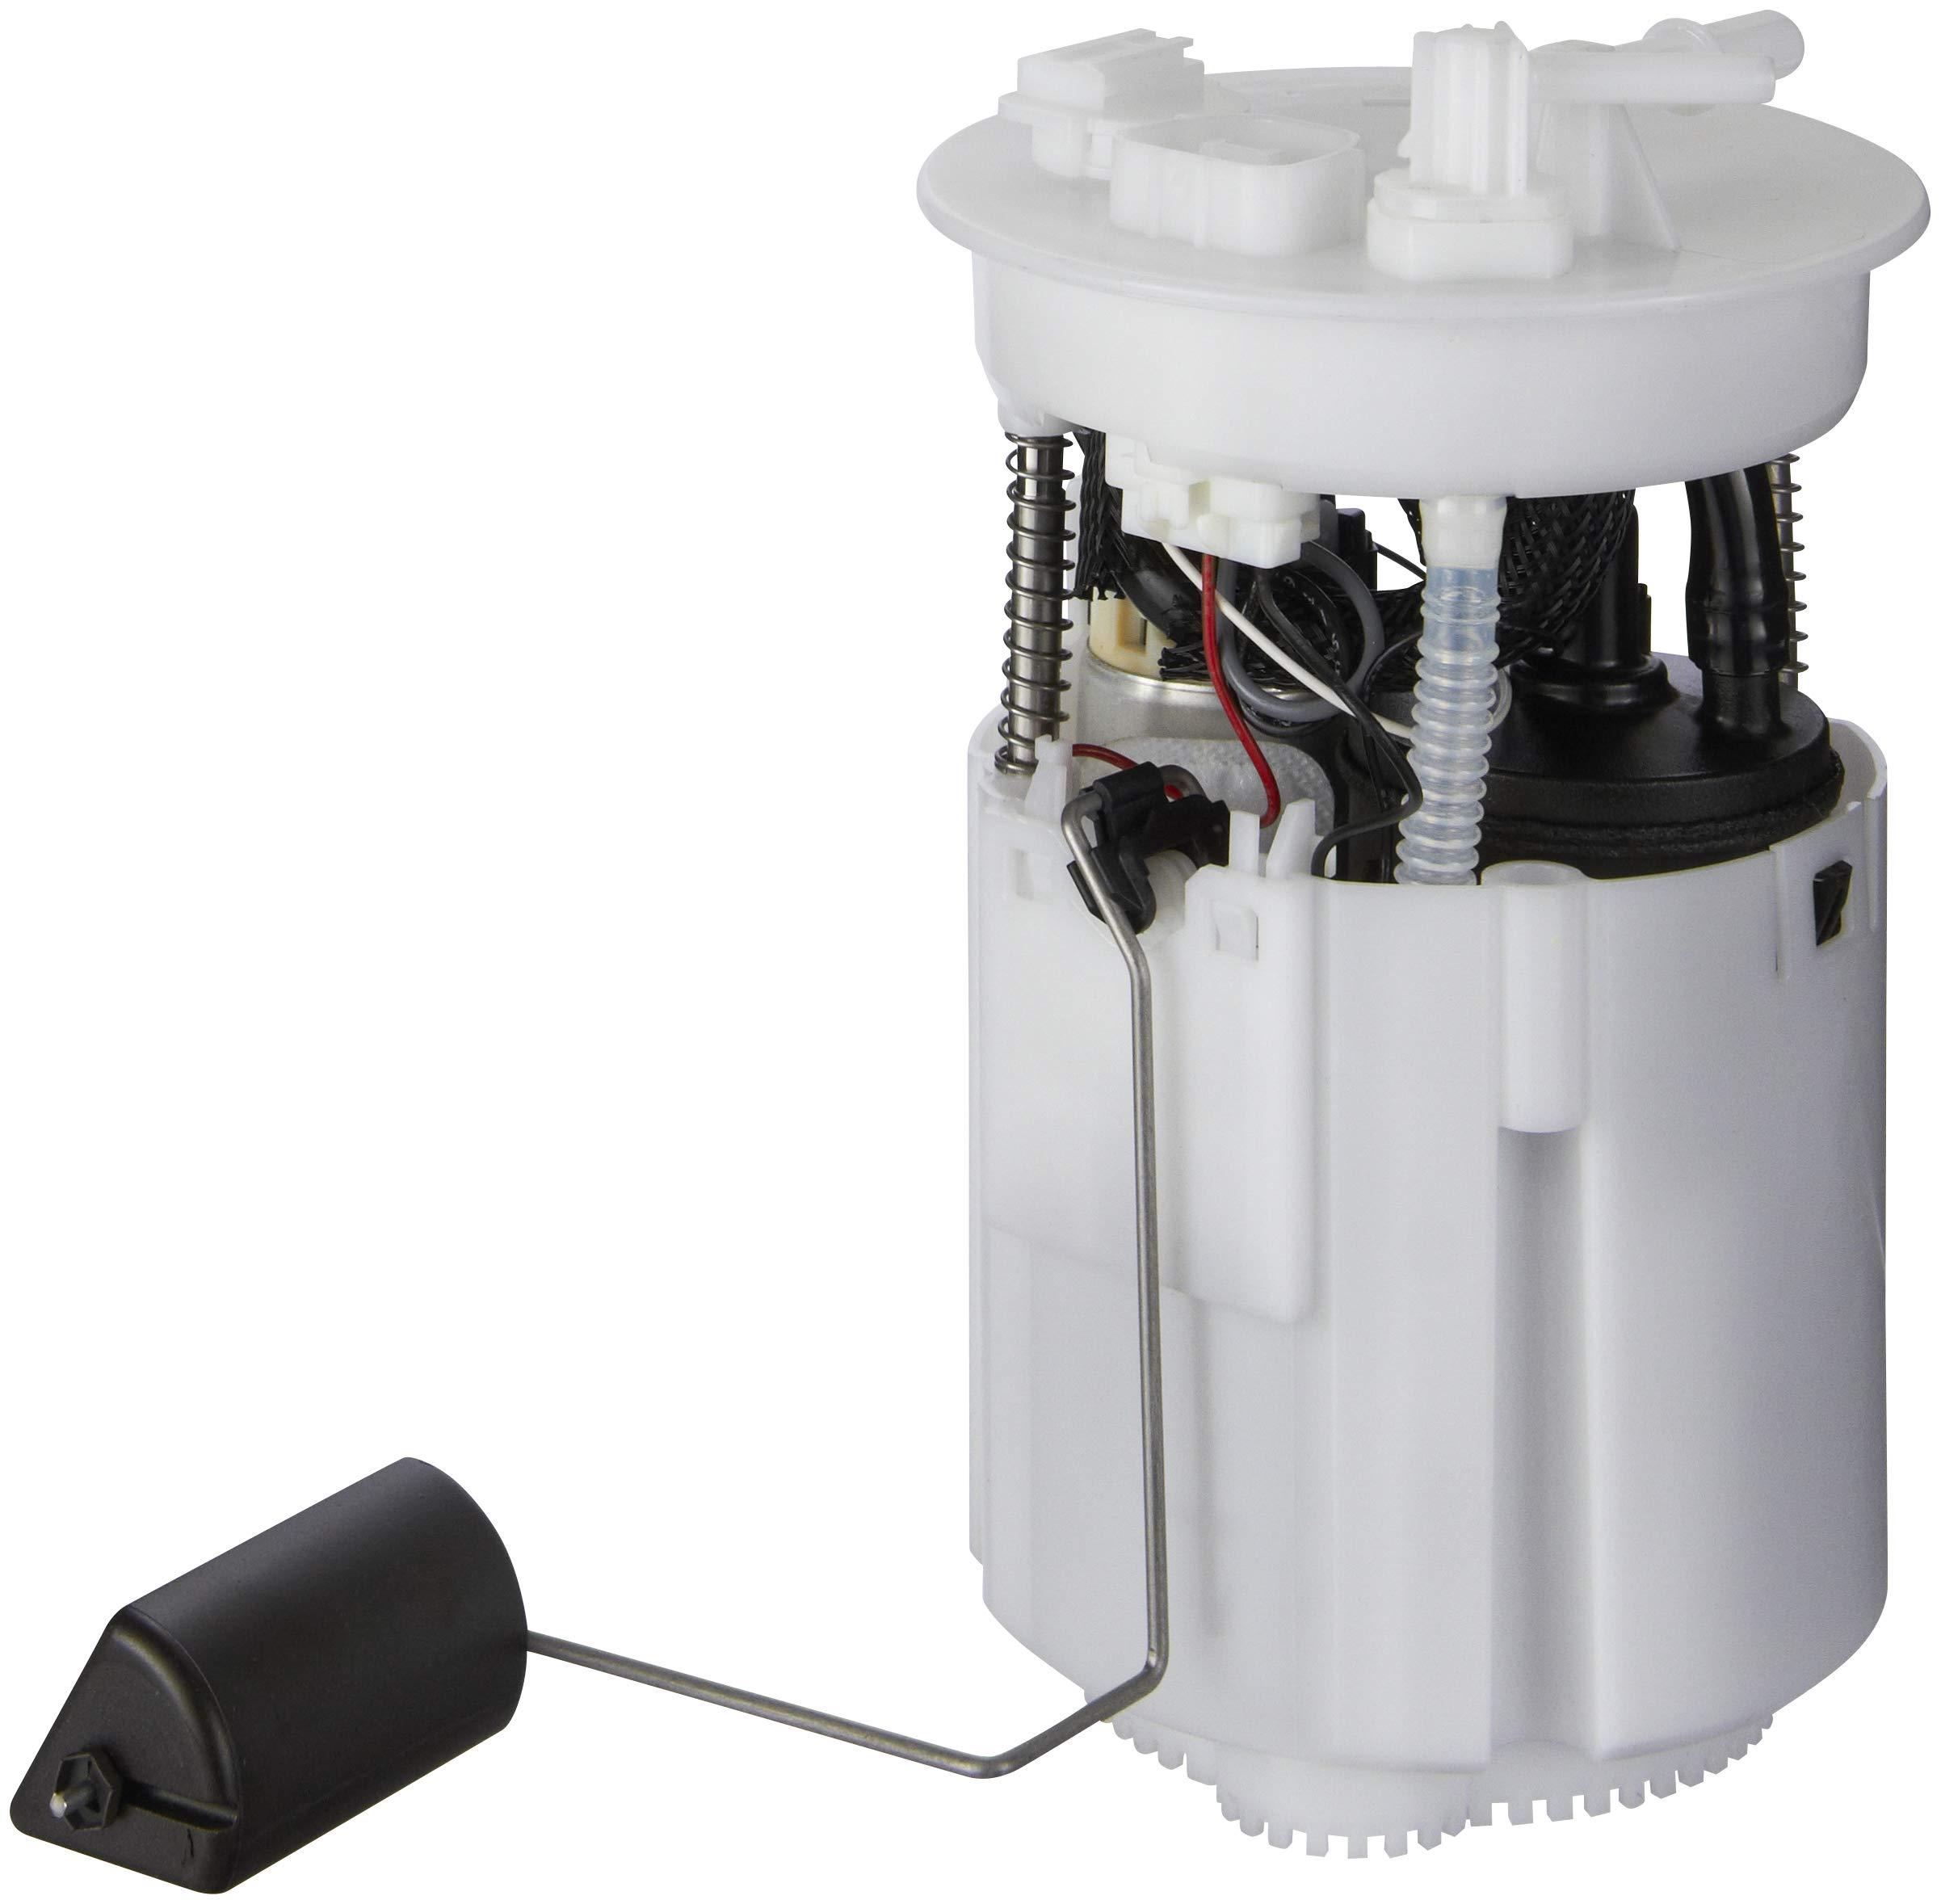 A-Premium Fuel Pump Assembly Compatible with Chrysler Sebring Dodge Stratus 2001 Mitsubishi Eclipse 2000-2001 Galant 1999-2000 2.4L 3.0L